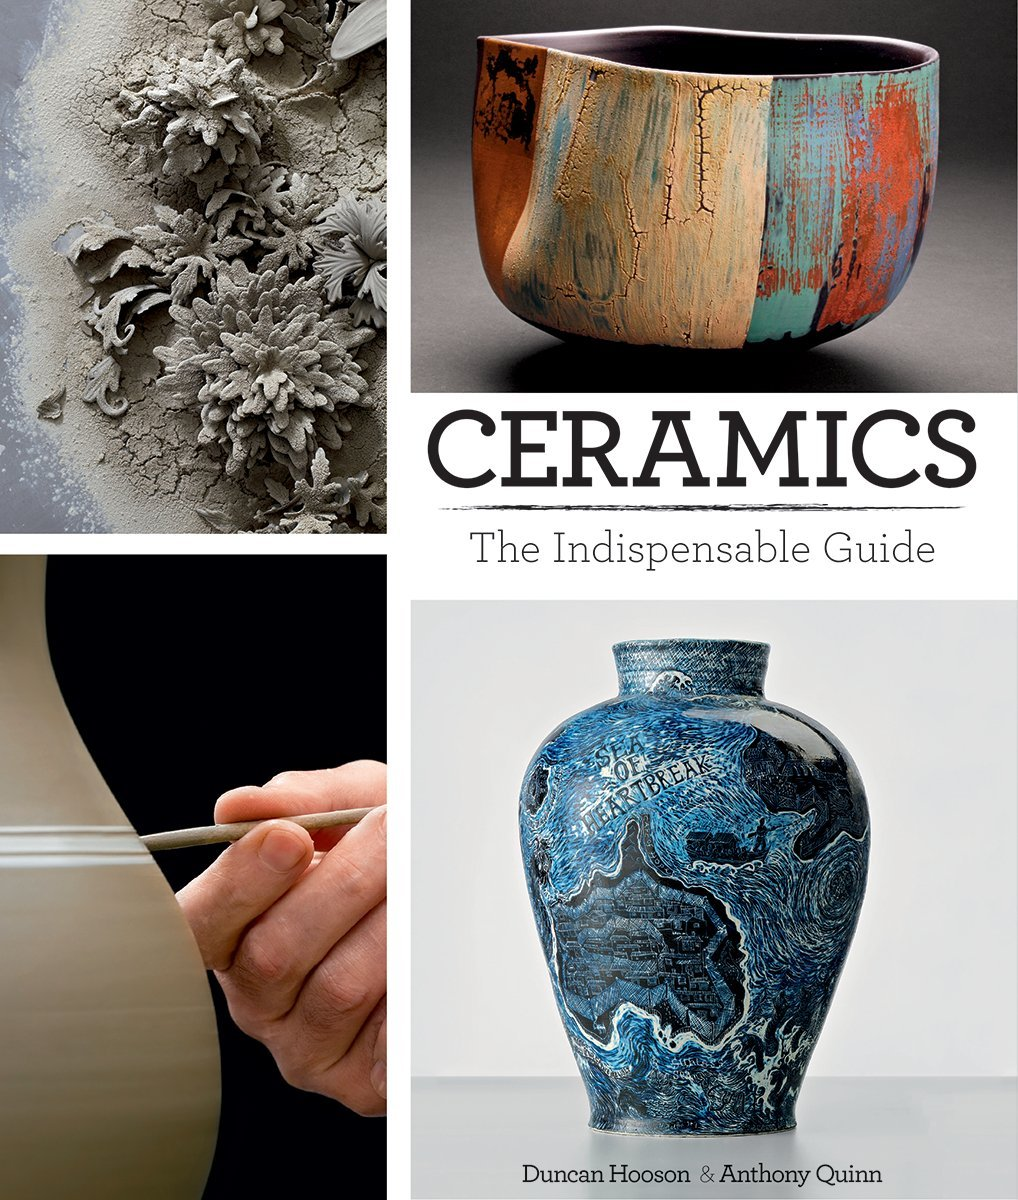 Ceramics The Indispensable Guide Duncan Hooson Anthony Quinn